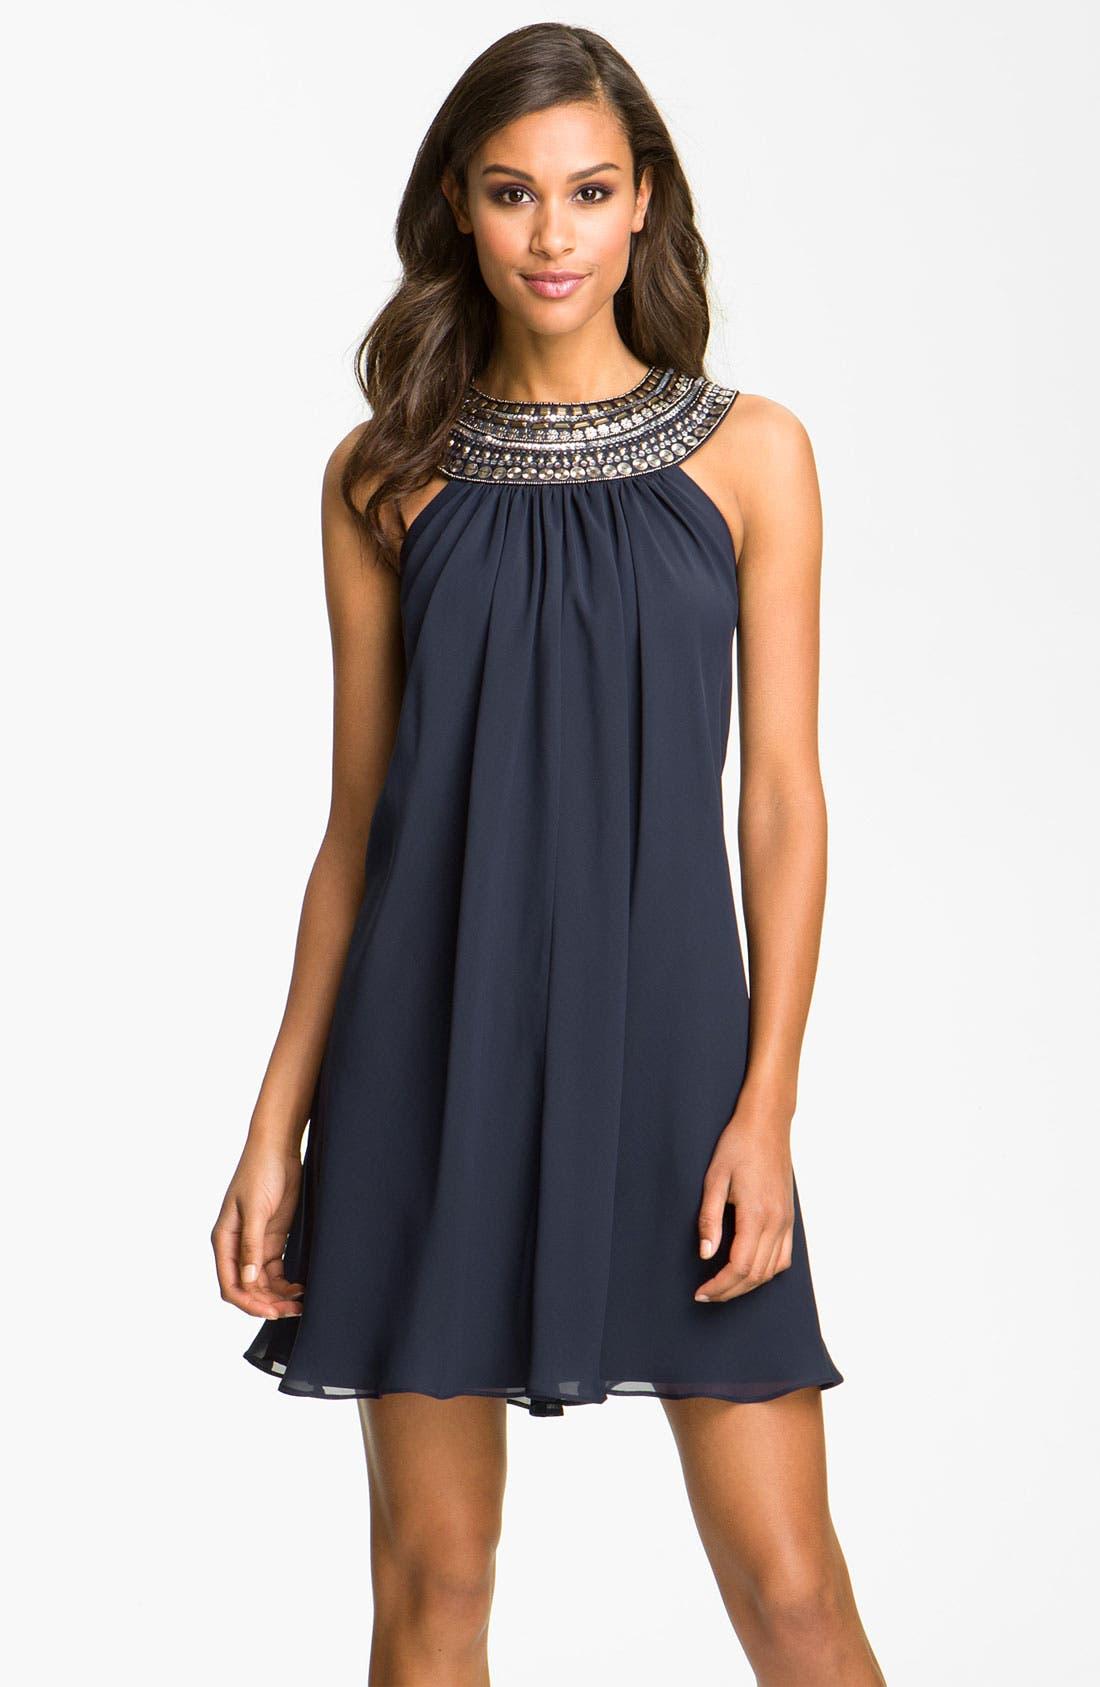 Alternate Image 1 Selected - JS Boutique Embellished Chiffon Trapeze Dress